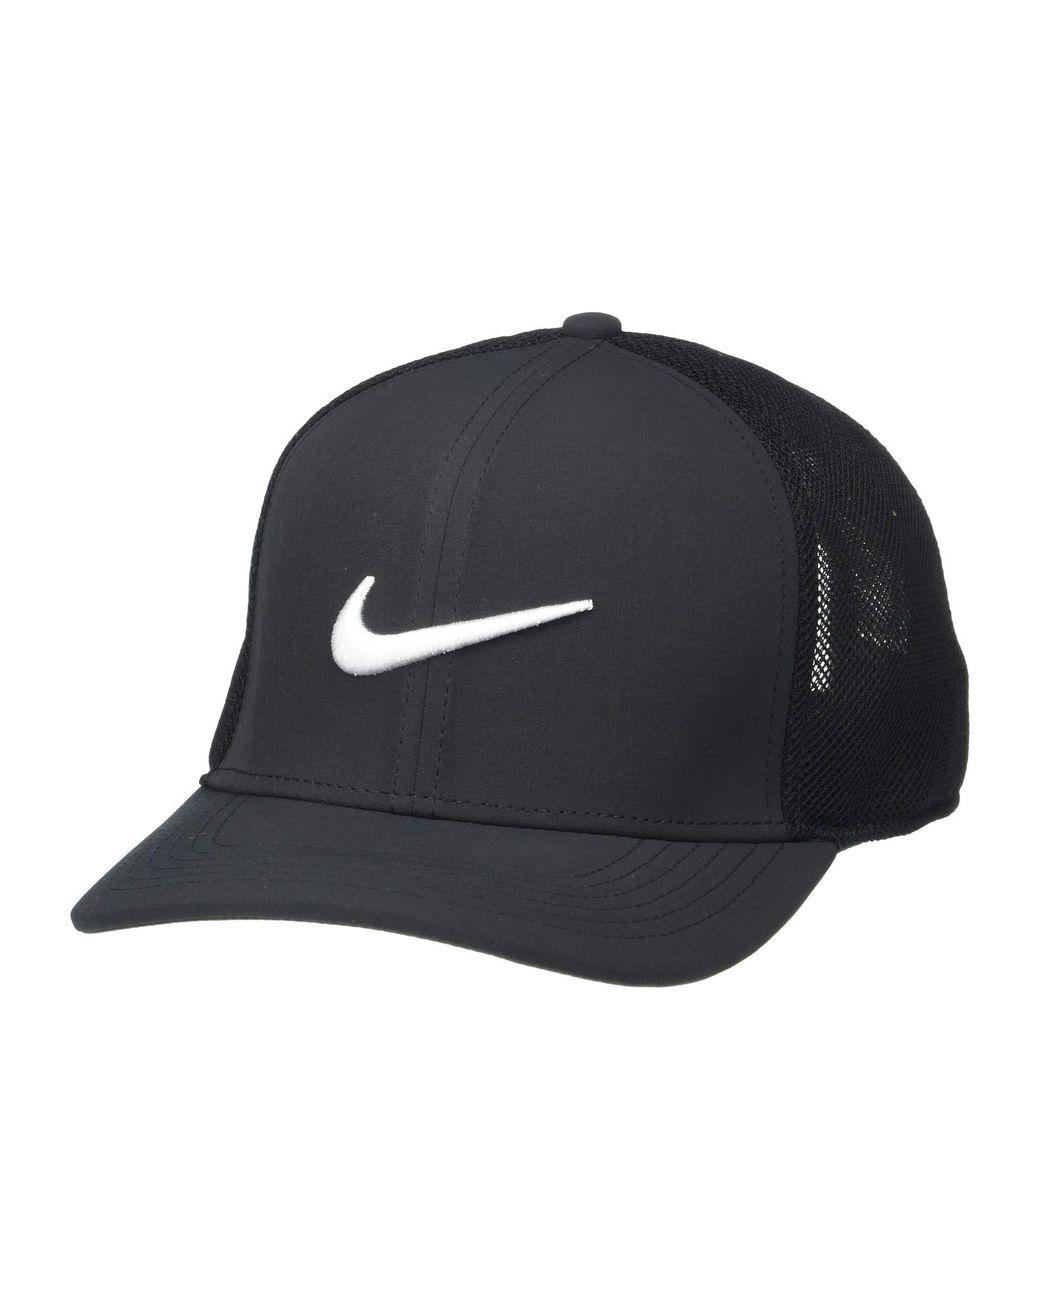 04a49478789cd Lyst - Nike Aerobill Classic99 Hat (black black white 2) Caps in ...